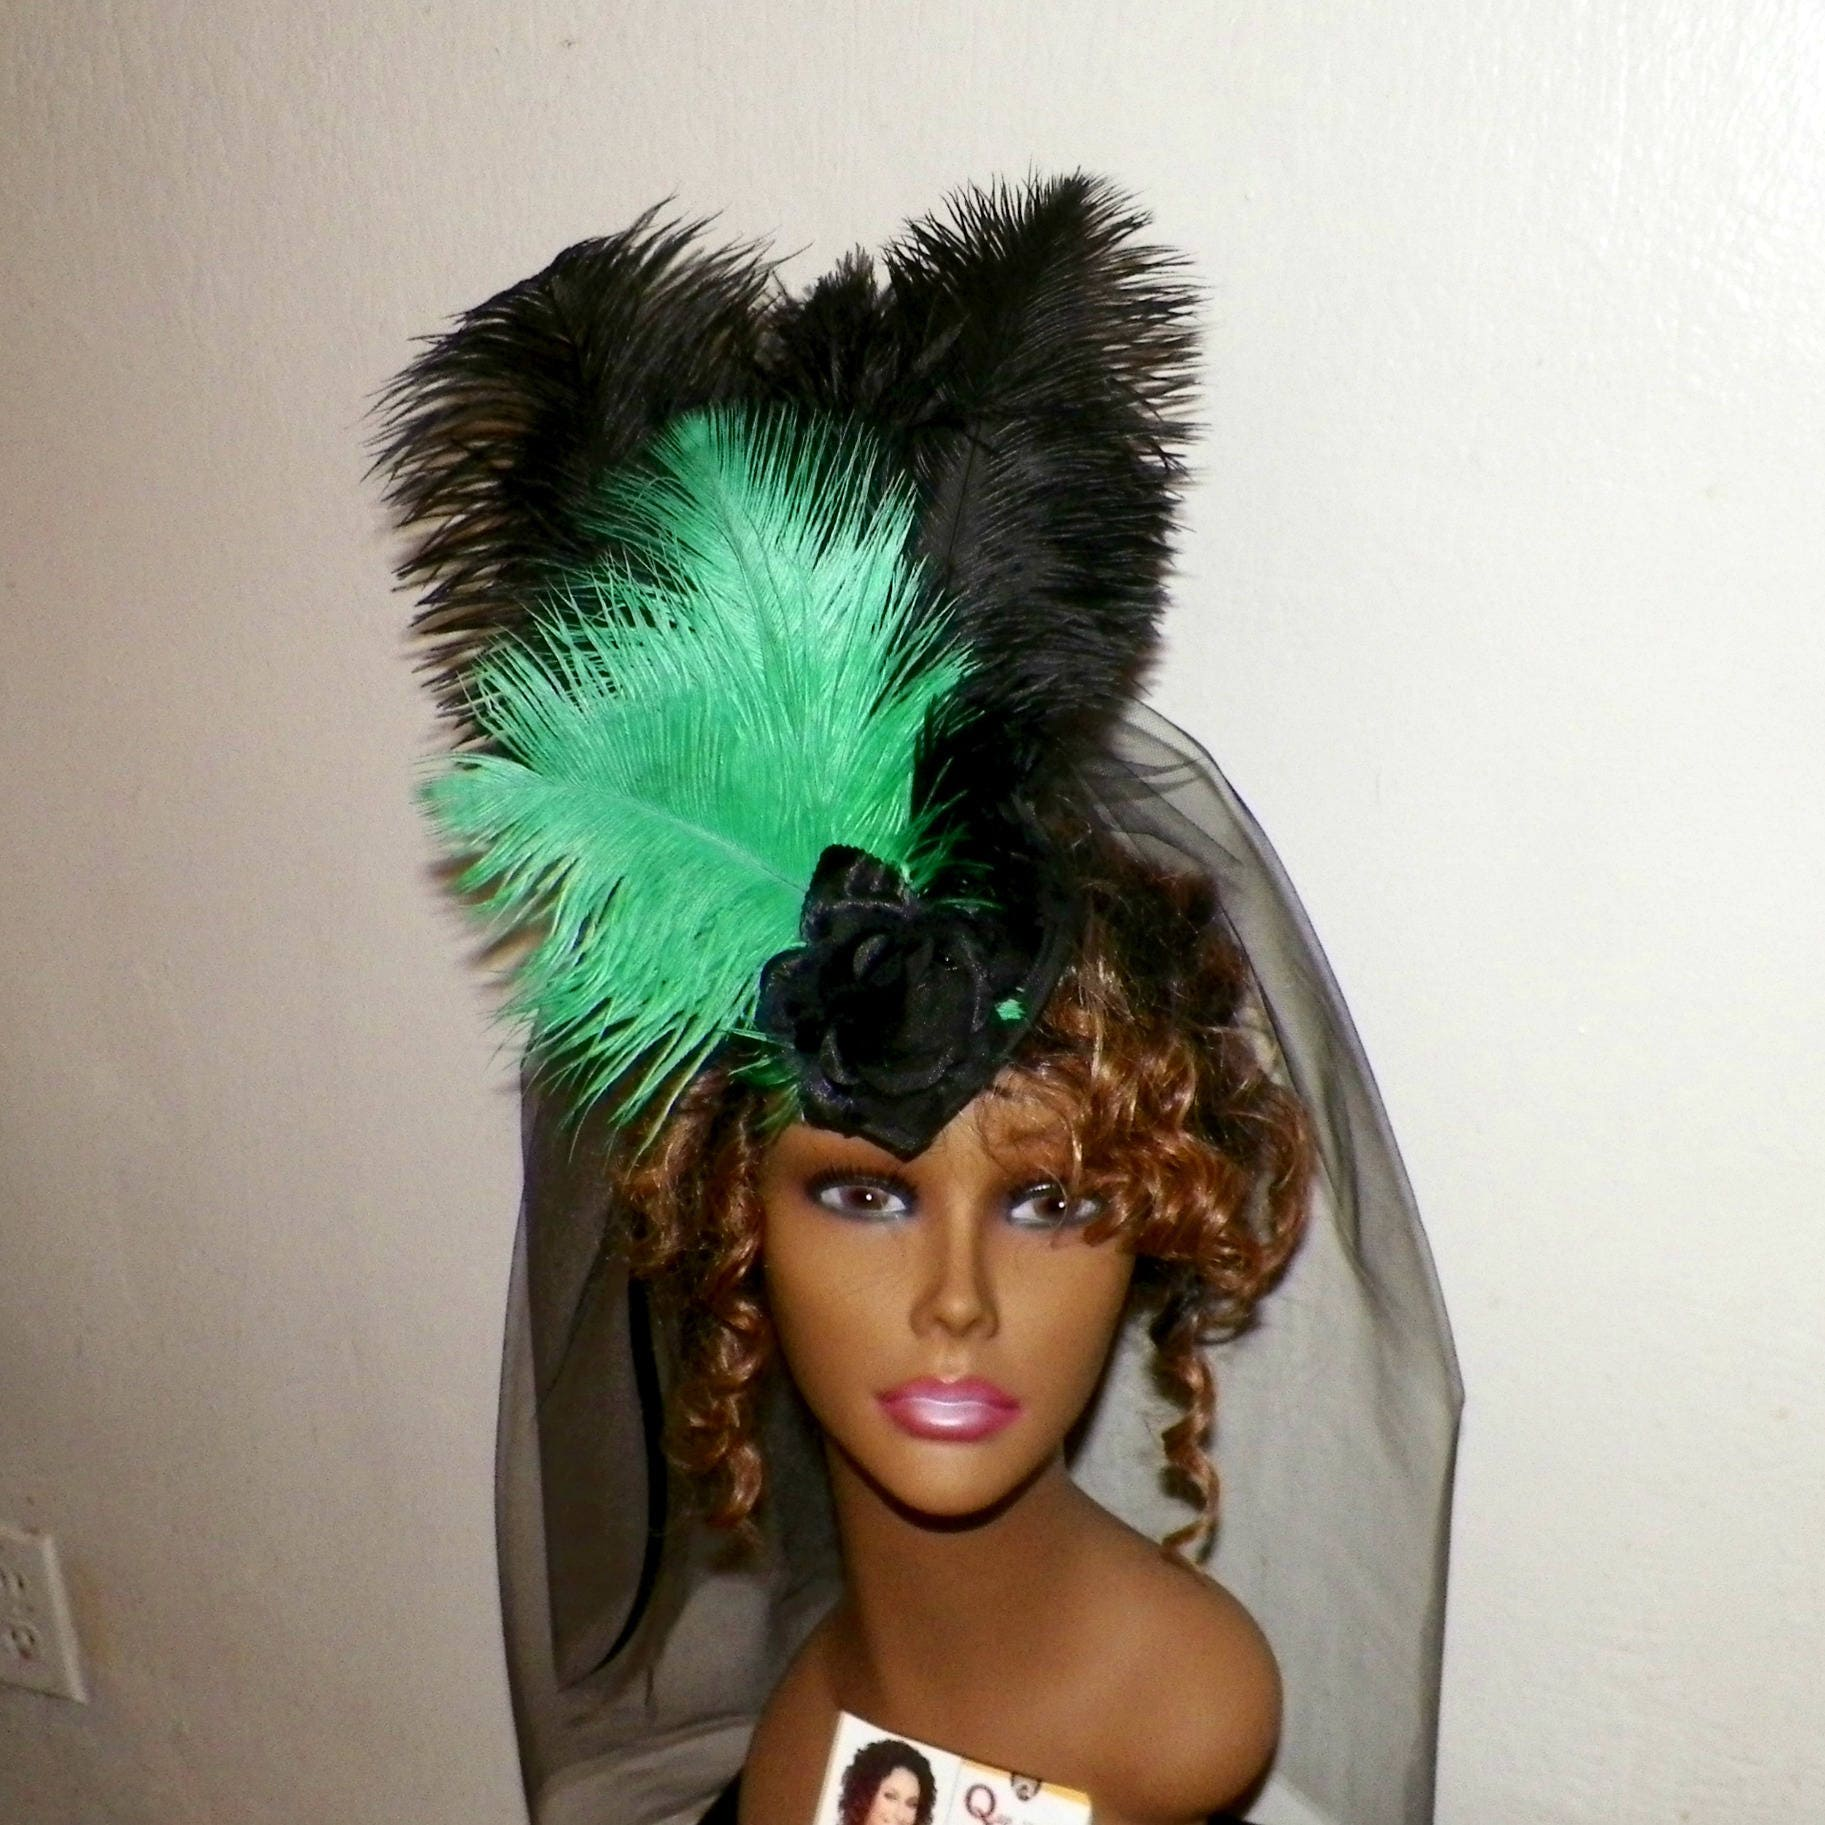 Black,Victorian,Gothic,Headdress,Green,Hat,Feather,Fascinator,Steampunk,Lolita,Costume,Headpiece,Old,West,Marie,Antoinette,Accessories,womans_hat,victorian_hat,Marie_Antoinette,gothic_hat,gothic_headdress,gothic_headpiece,lolita_hat,black_fascinator,gothic_fascinator,steampunk_hat,feather_headdress,headpiece,green_fascinator